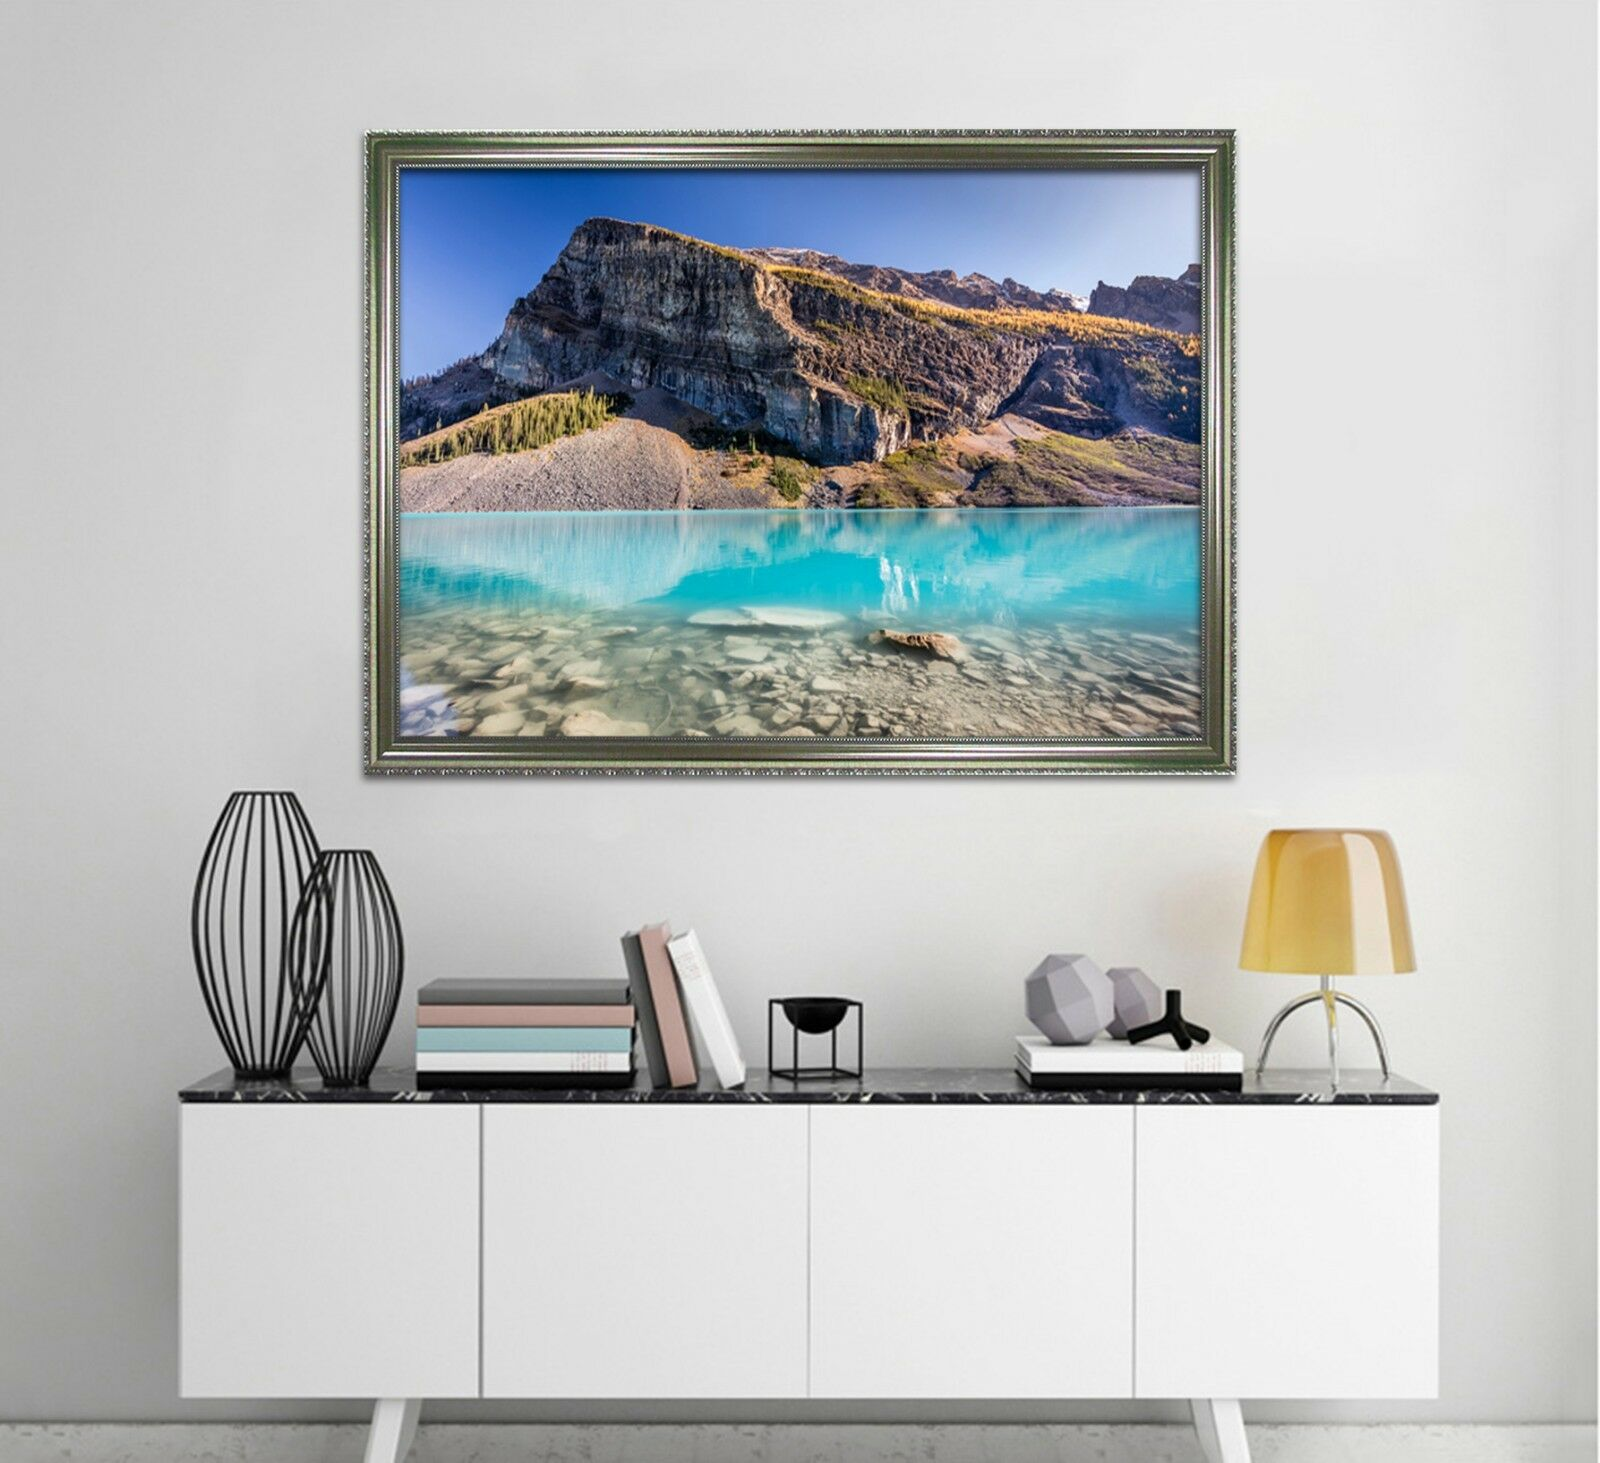 3D bleu Lake Hills 2 Framed Poster Home Decor Print Painting Art AJ WALLPAPER